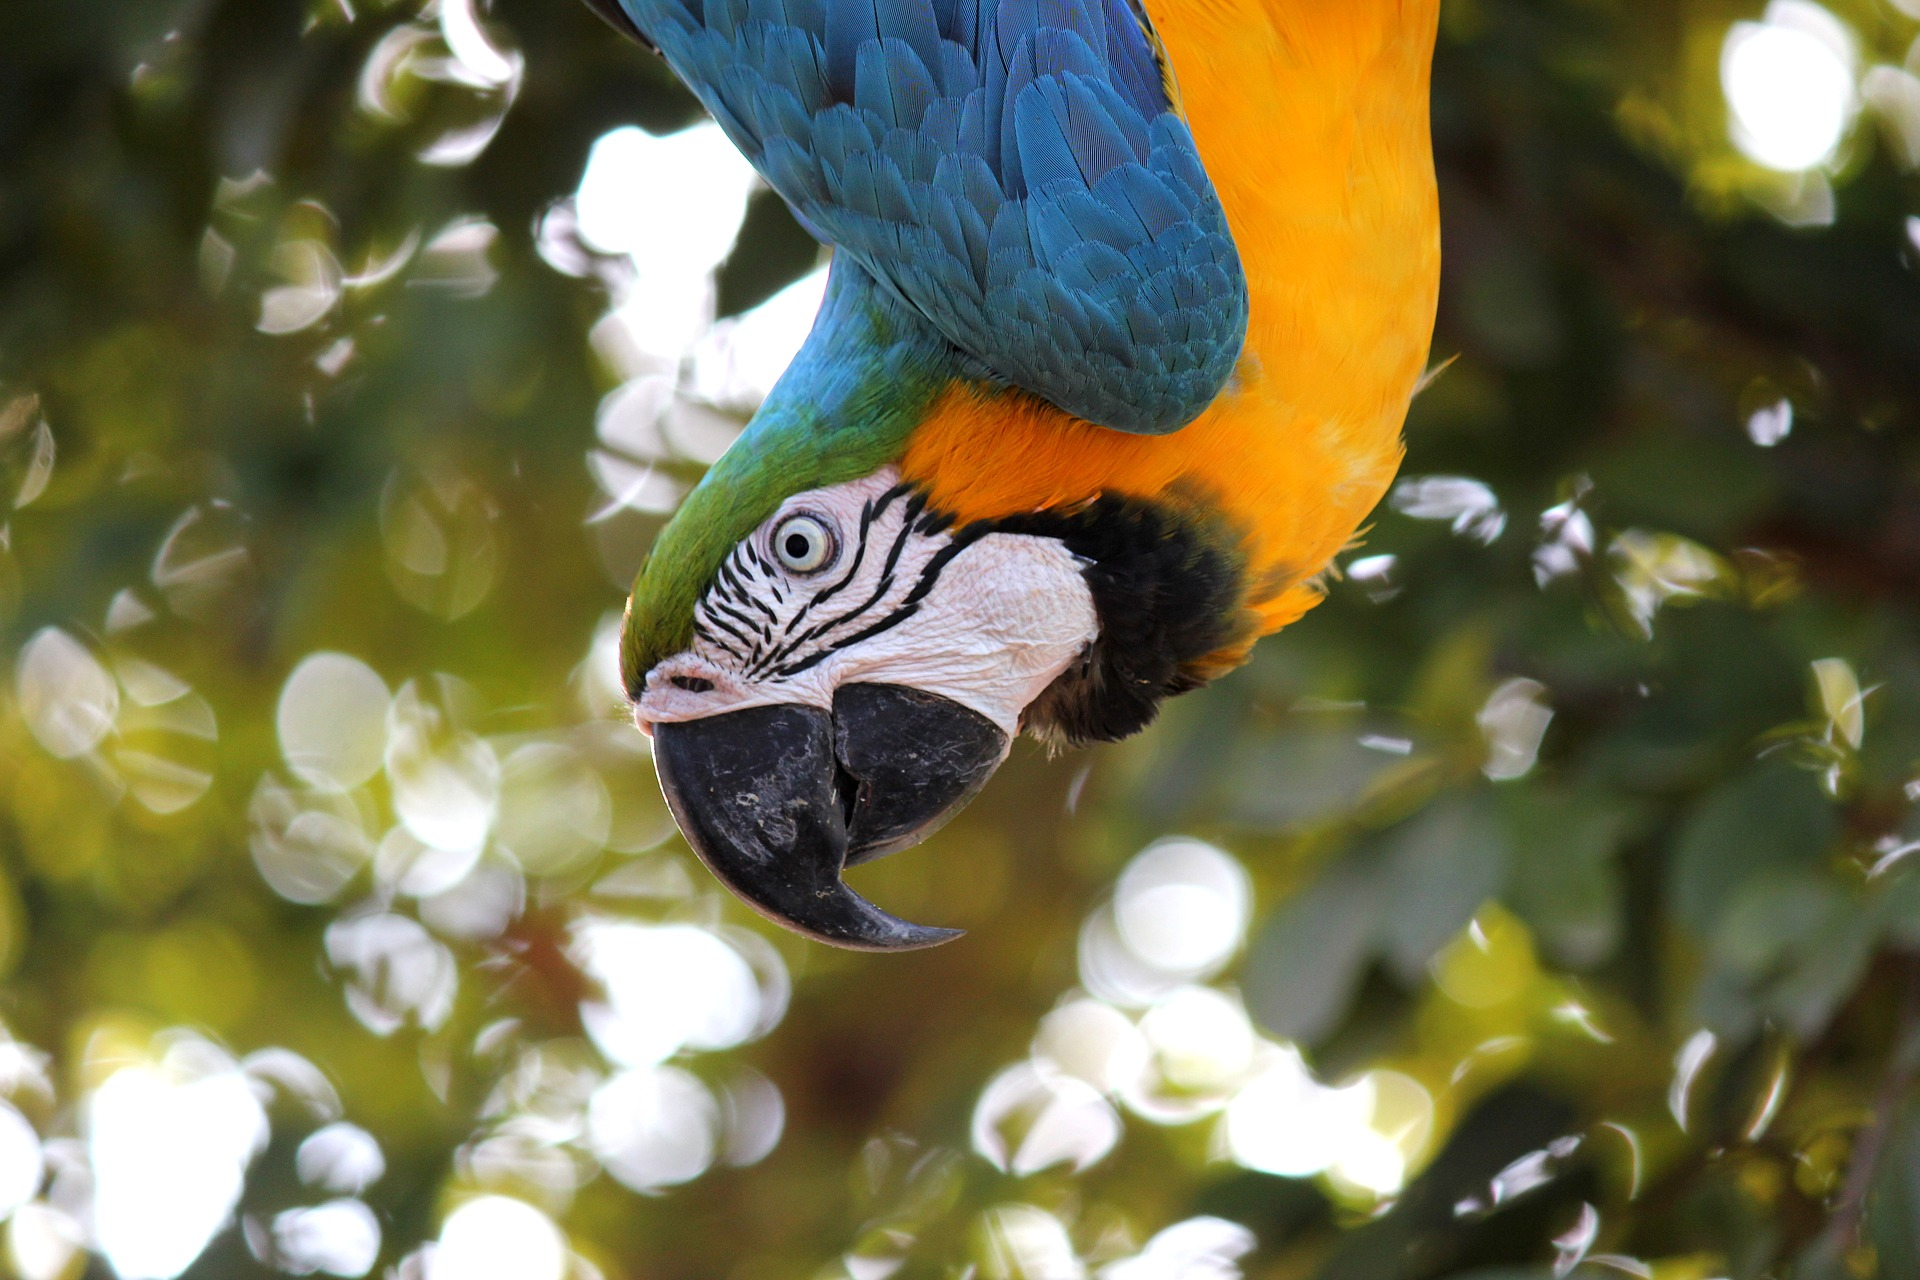 macaw-1817586_1920.jpg